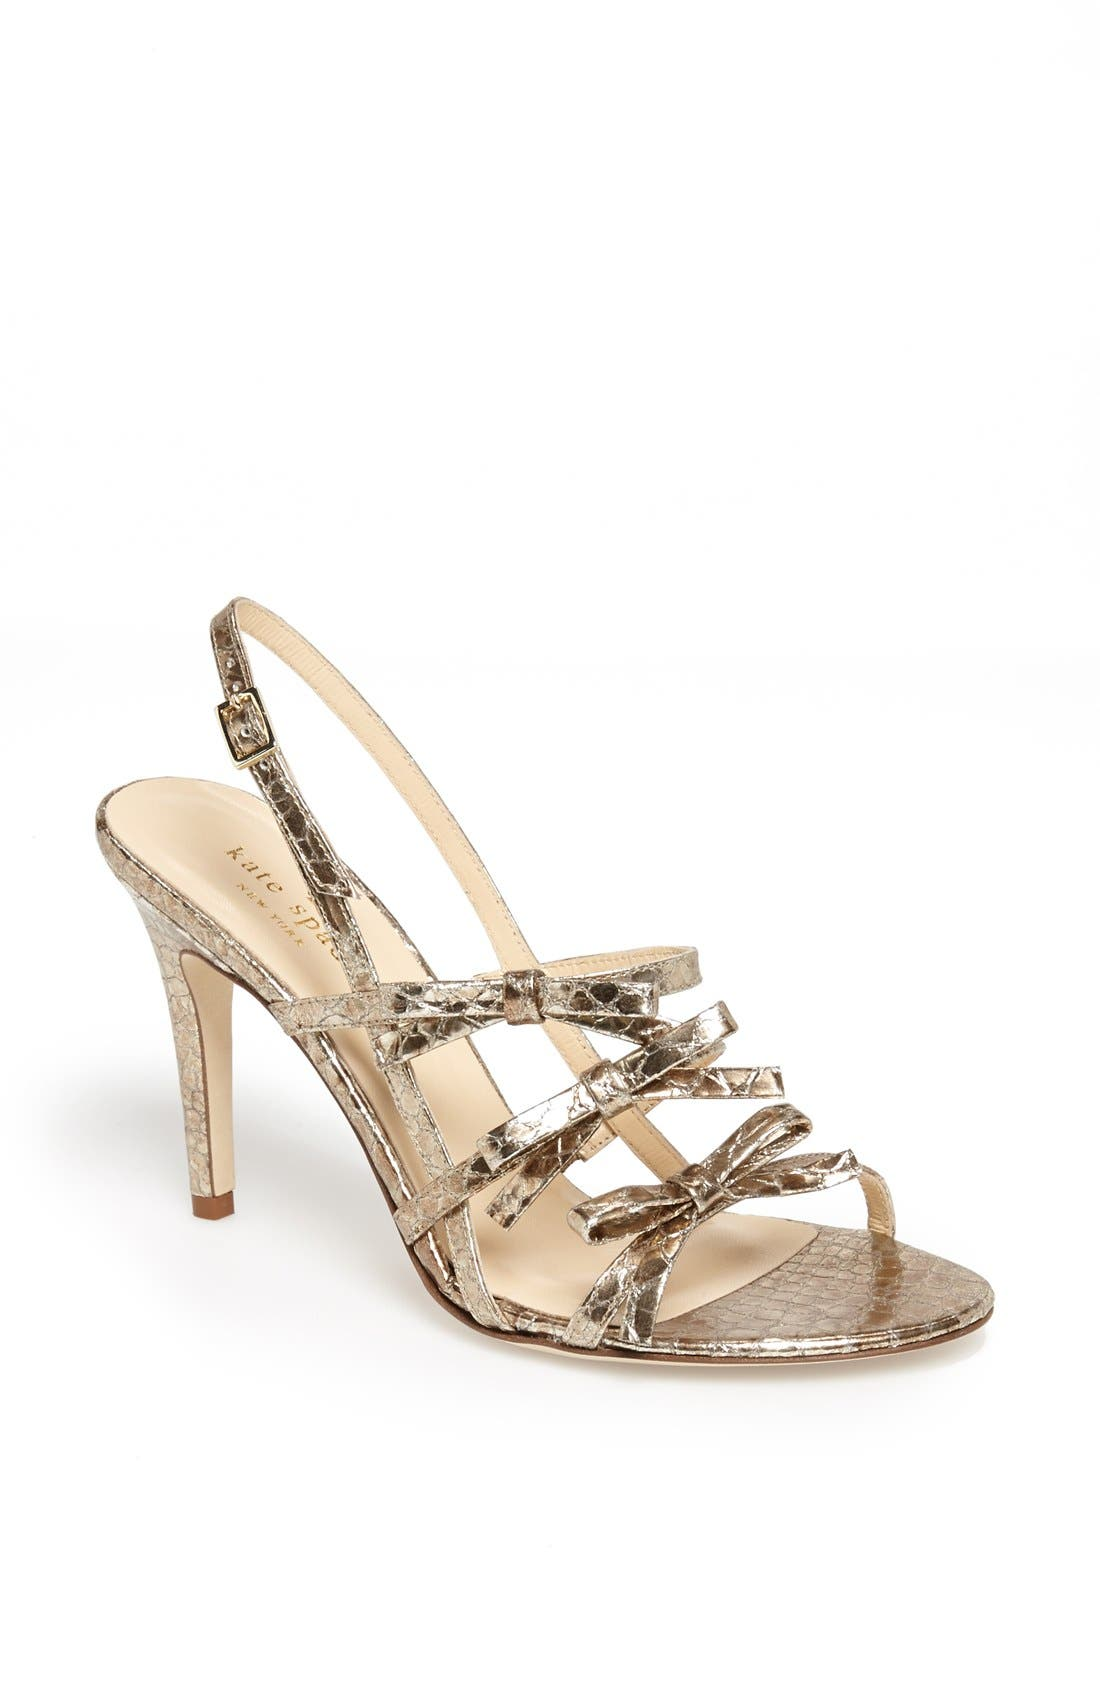 Alternate Image 1 Selected - kate spade new york 'sally' sandal (Women)